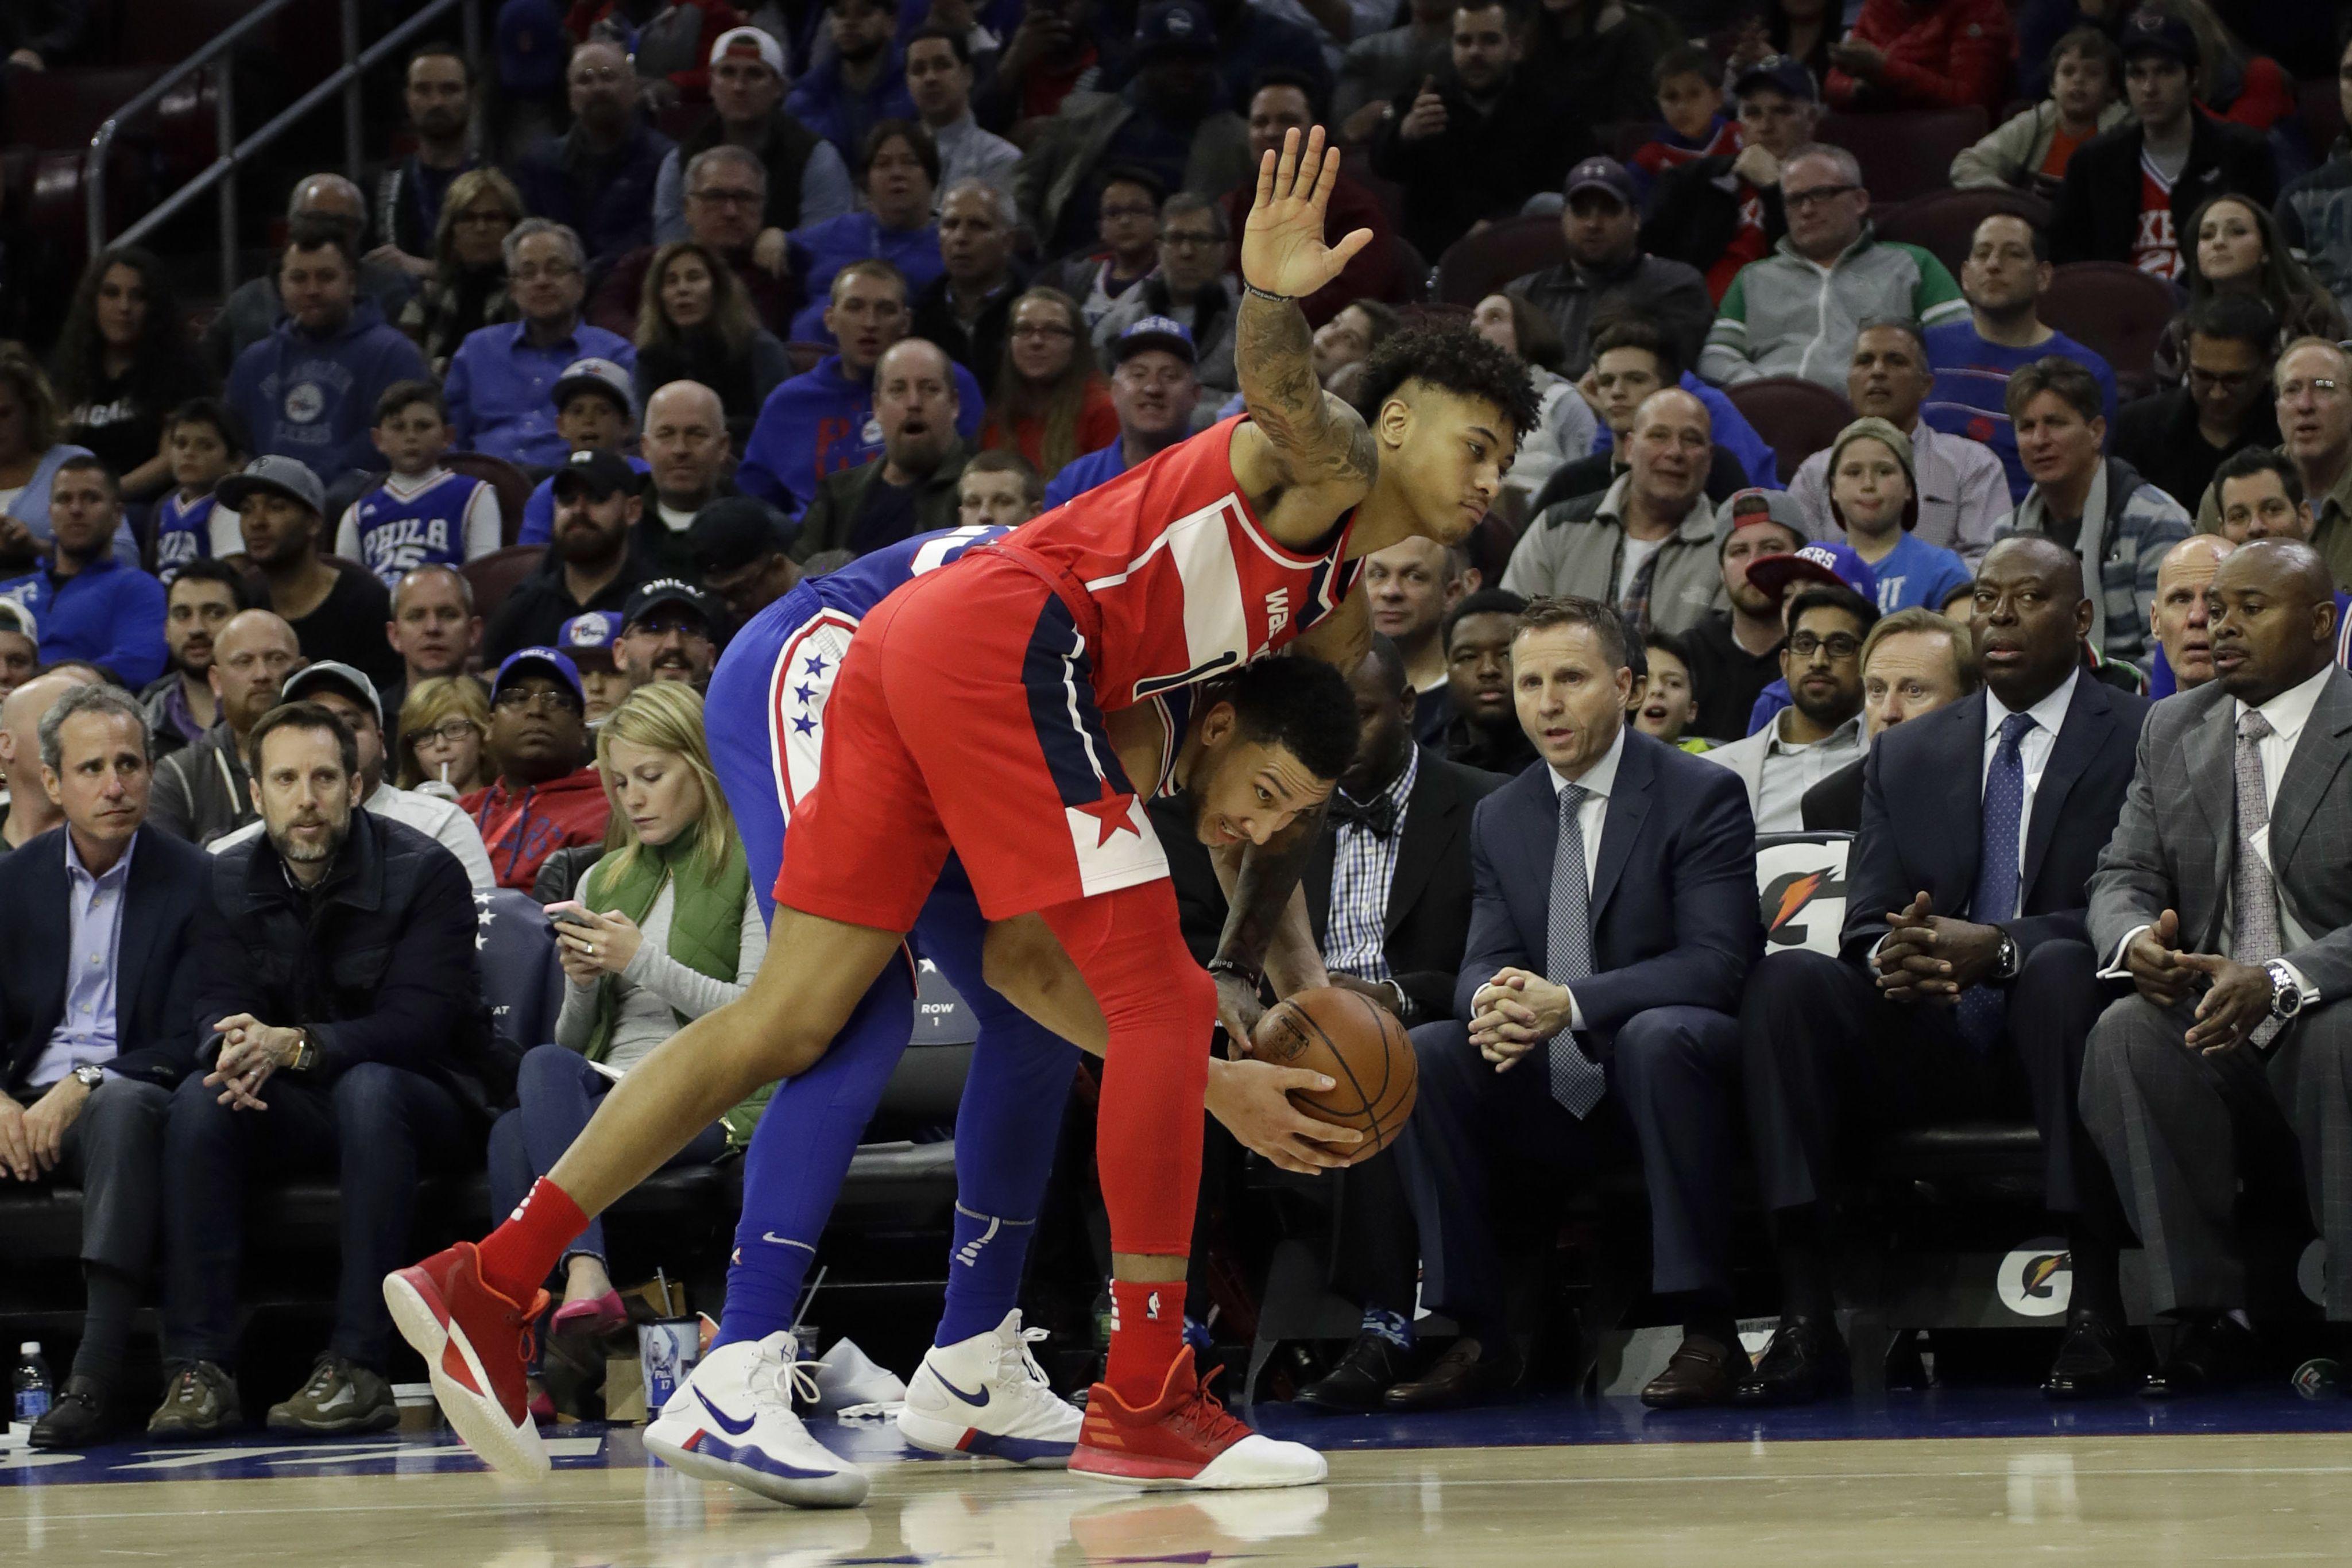 Wizards_76ers_basketball_31596.jpg-d92bf_s4096x2731